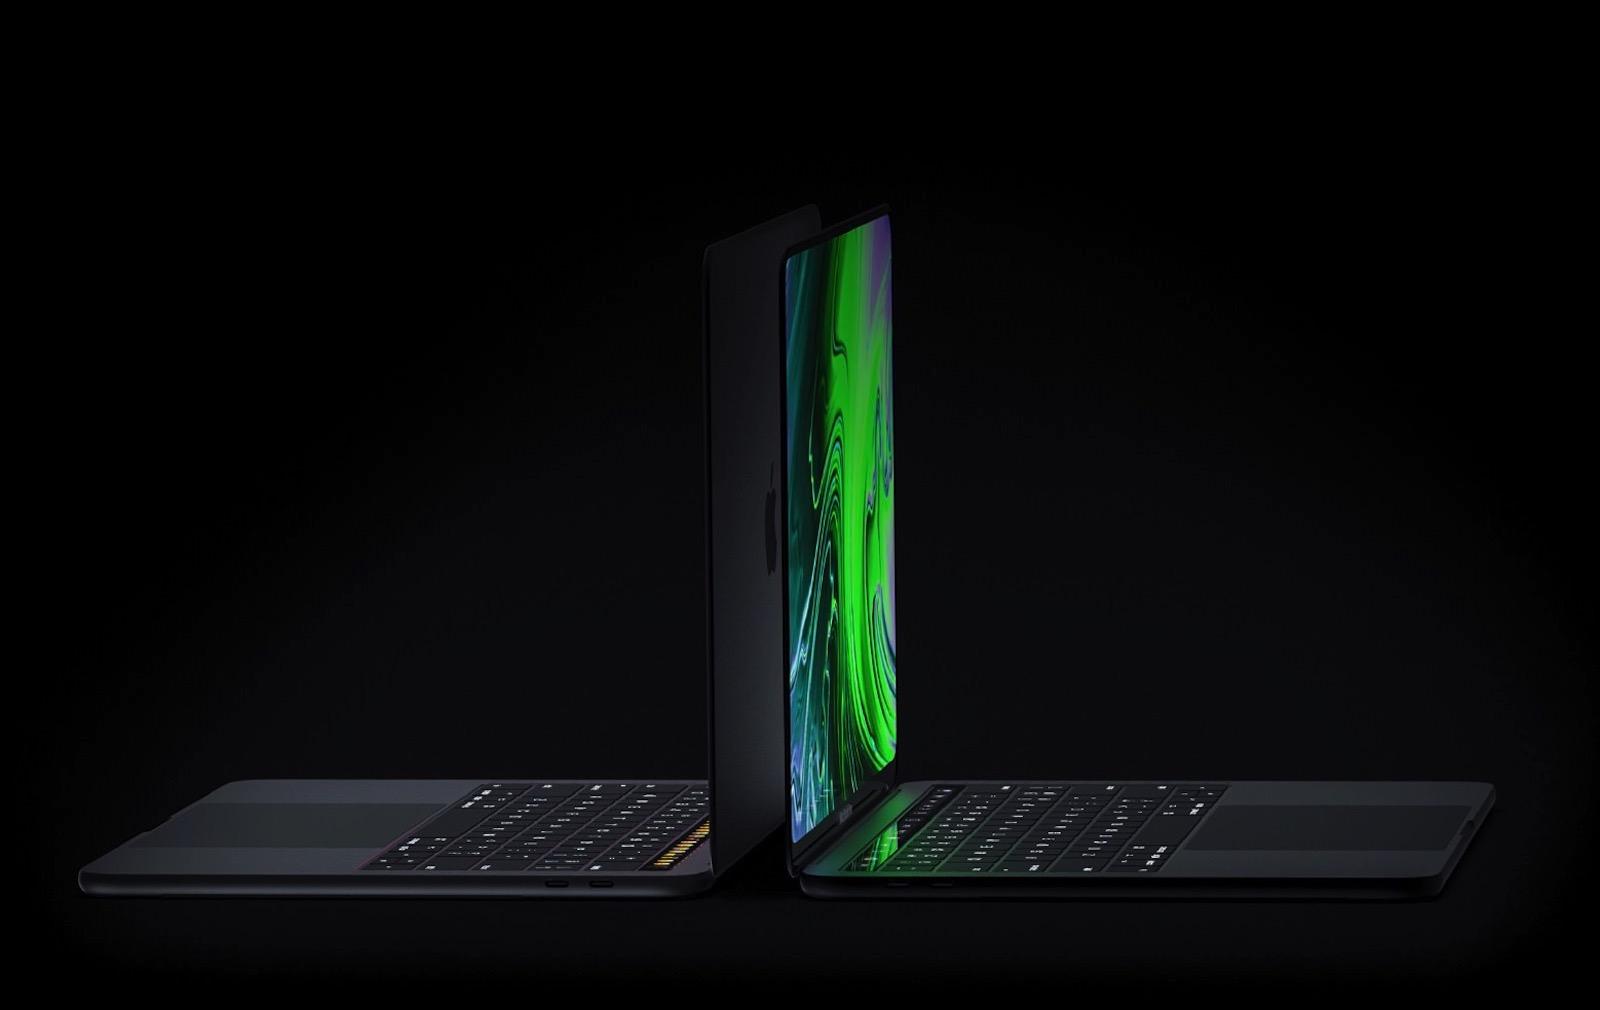 MacBook Pro(2019) concept